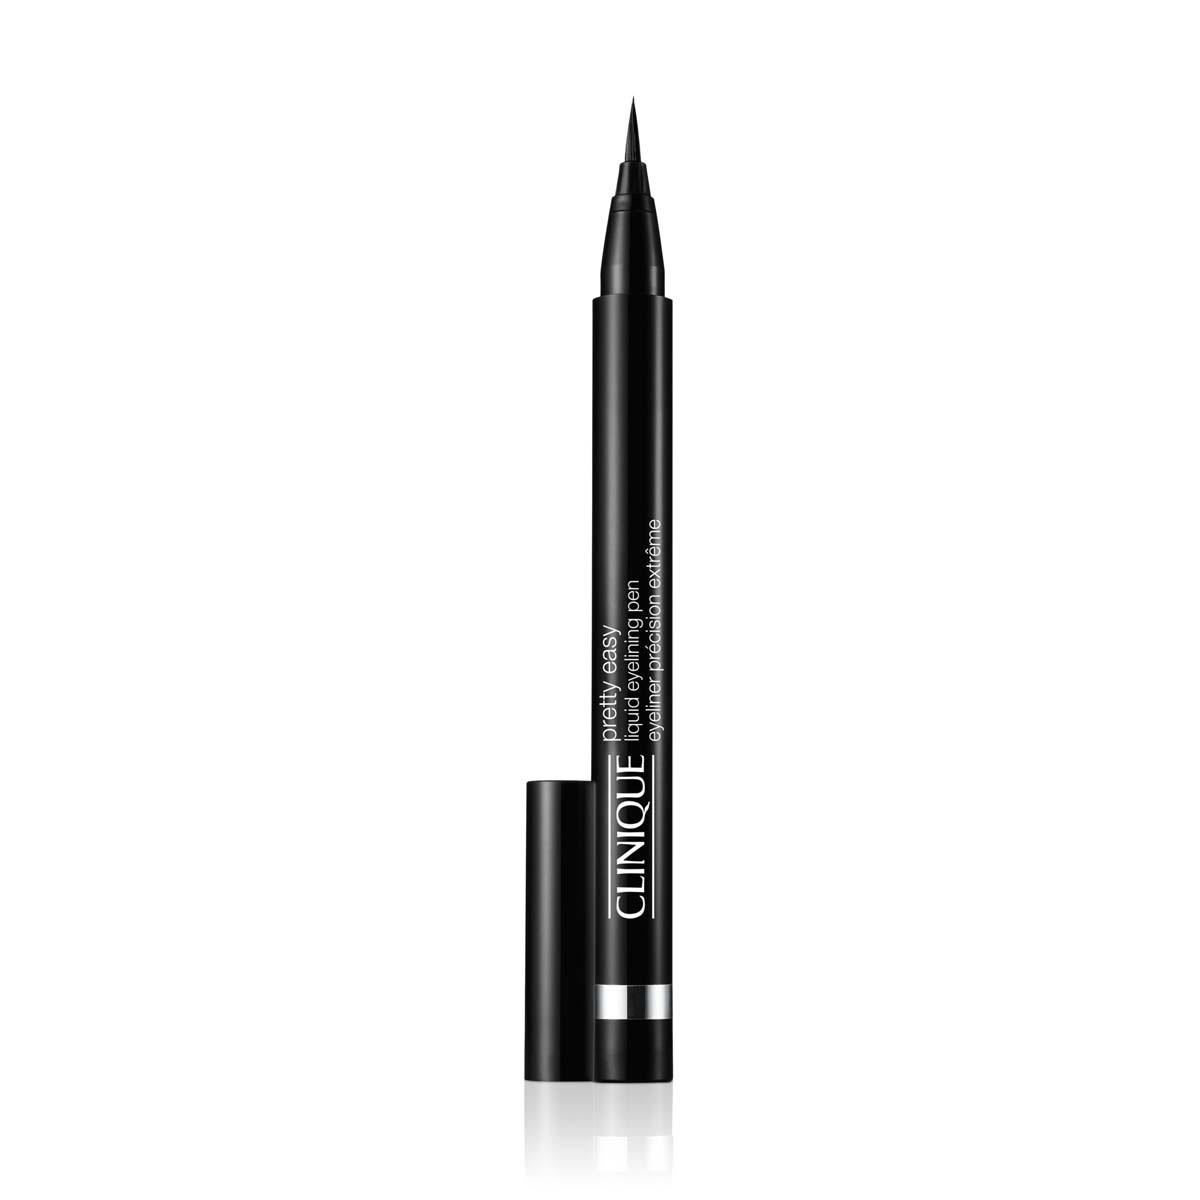 Clinique pretty easy liquid eyelining pen - 01 black, 01 BLACK, large image number 0